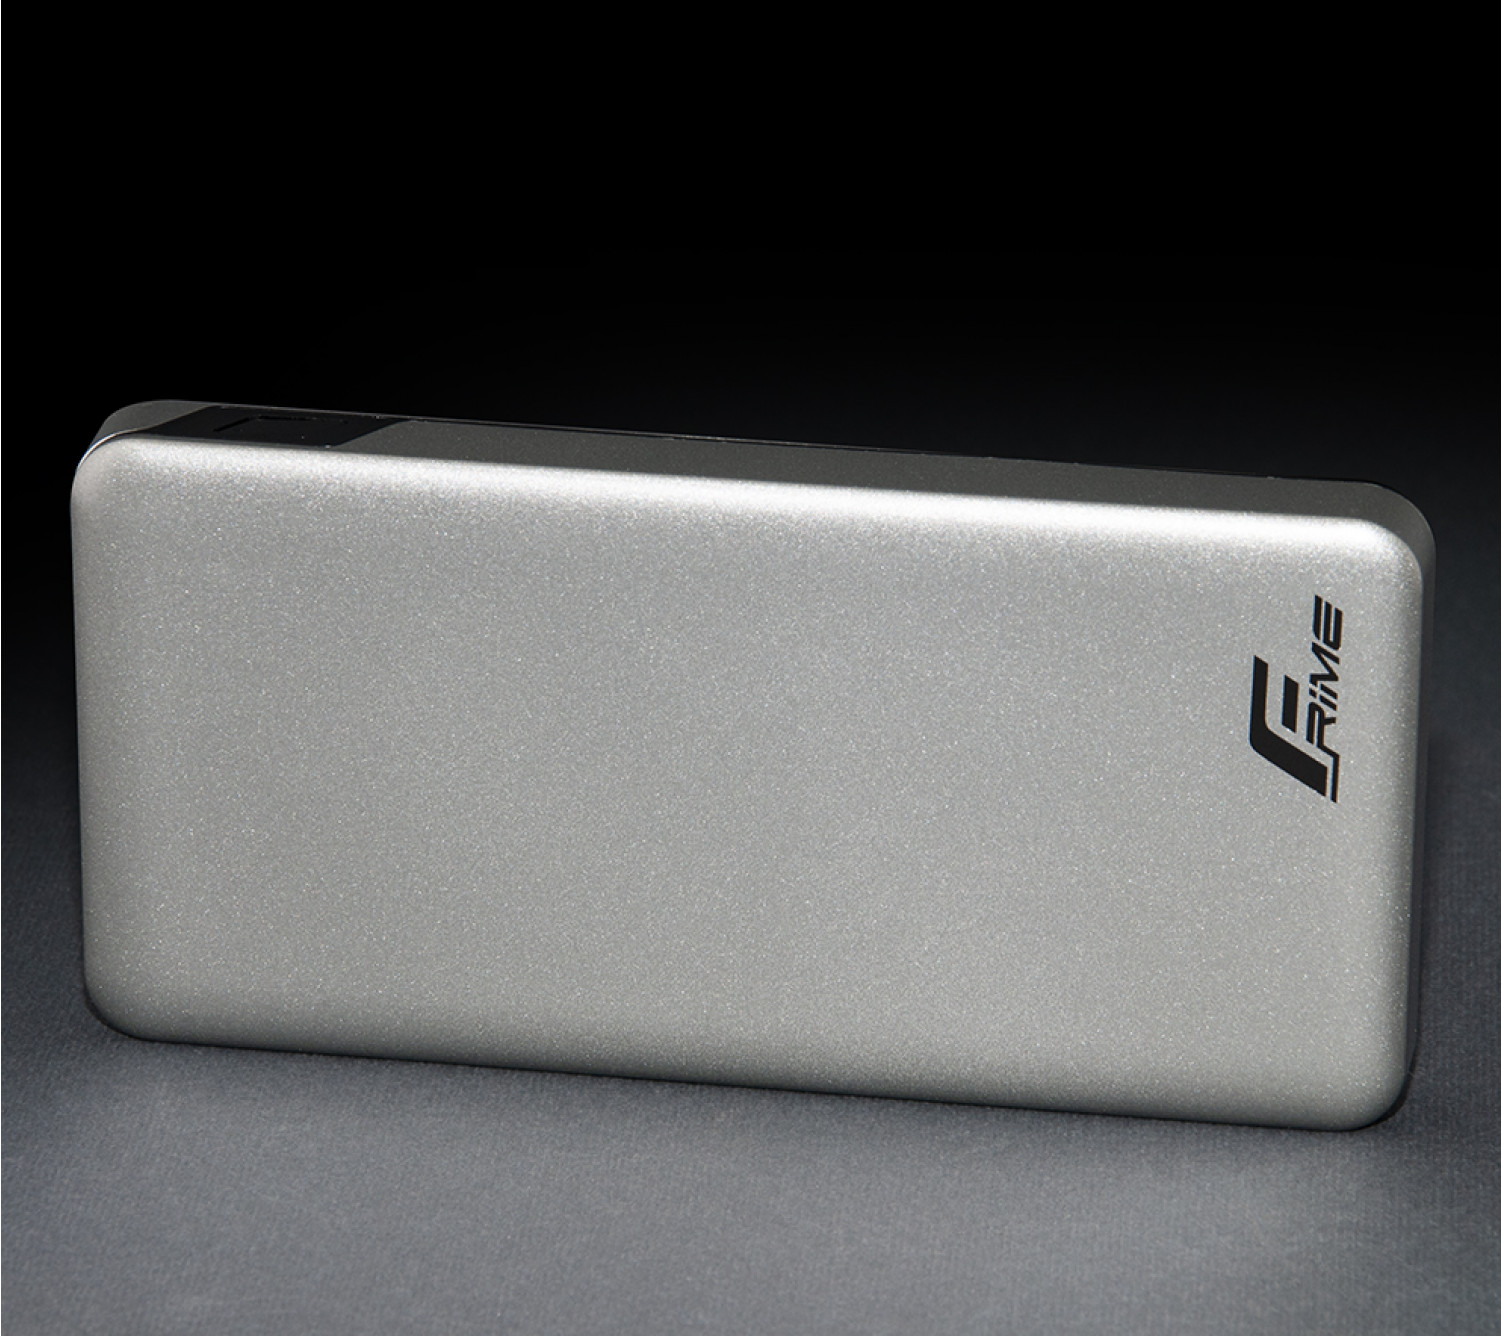 Универсальная мобильная батарея Frime 10000mAh QC3.0 Silver Grey (FPB1033QCD.SG)